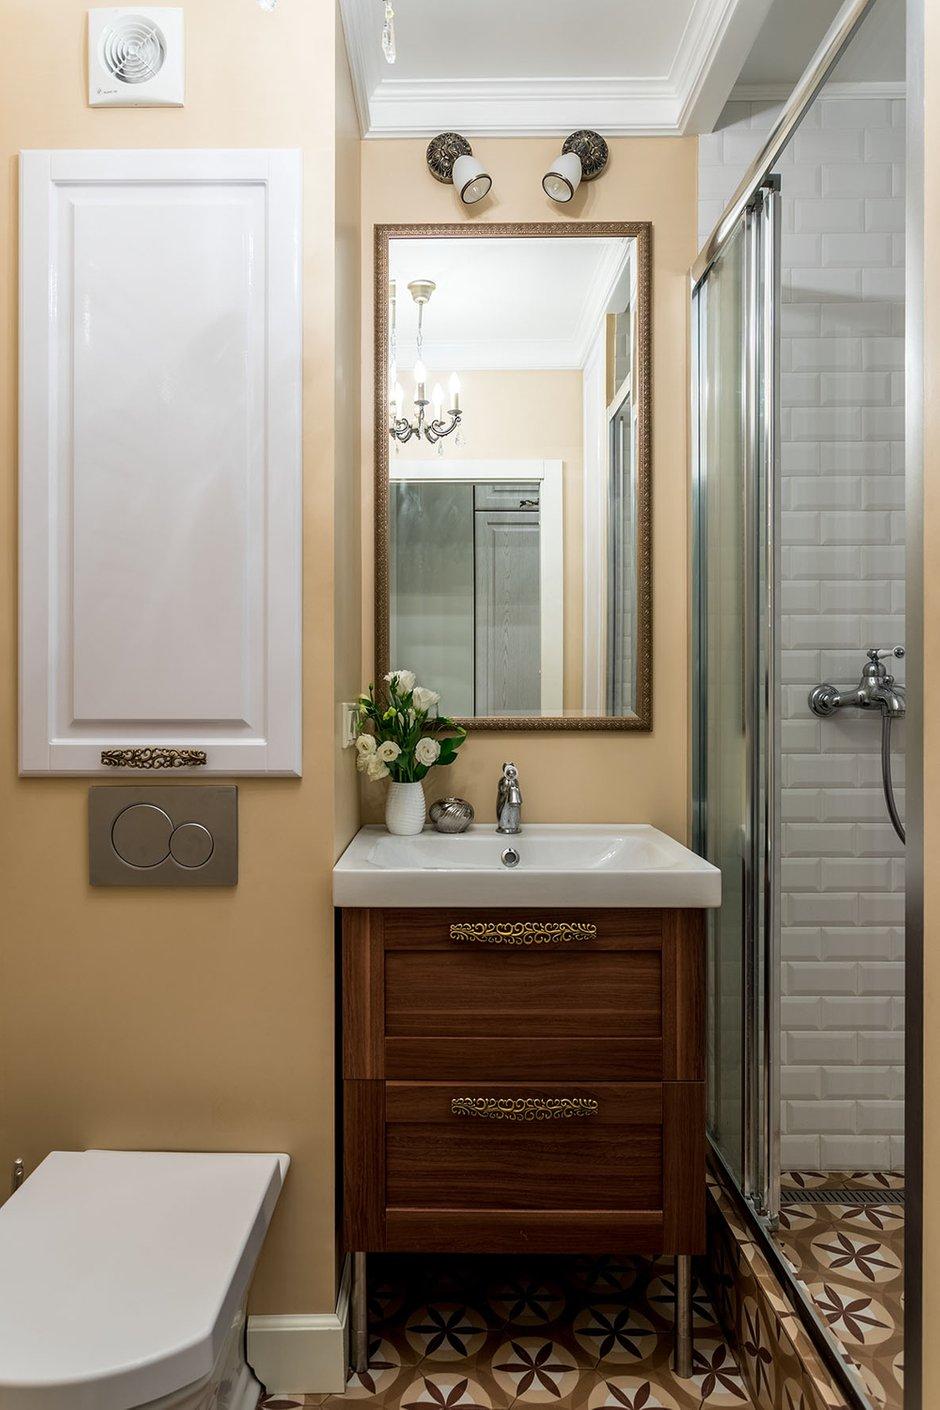 Фотография: Ванная в стиле Прованс и Кантри, Малогабаритная квартира, Квартира, Проект недели, Наталья Сытенкова – фото на INMYROOM